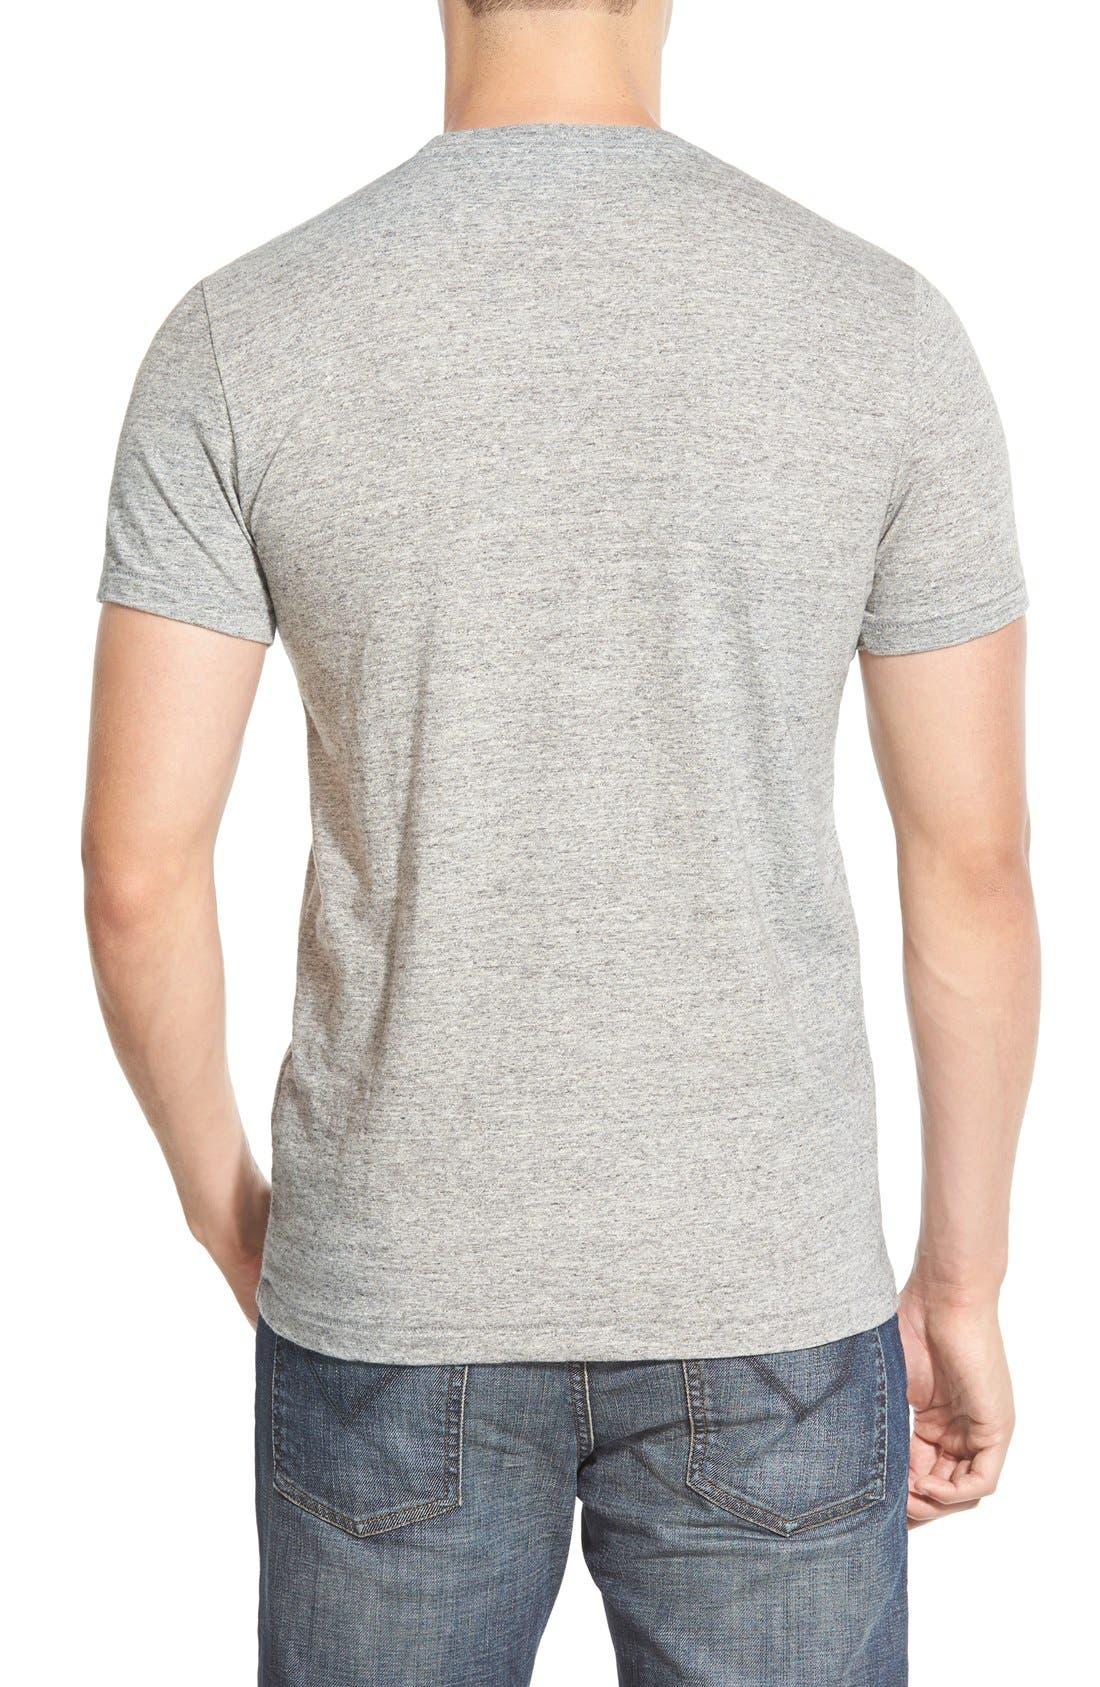 Double Face Jersey Pocket Crewneck T-Shirt,                             Alternate thumbnail 3, color,                             ANTI-GREY HEATHER